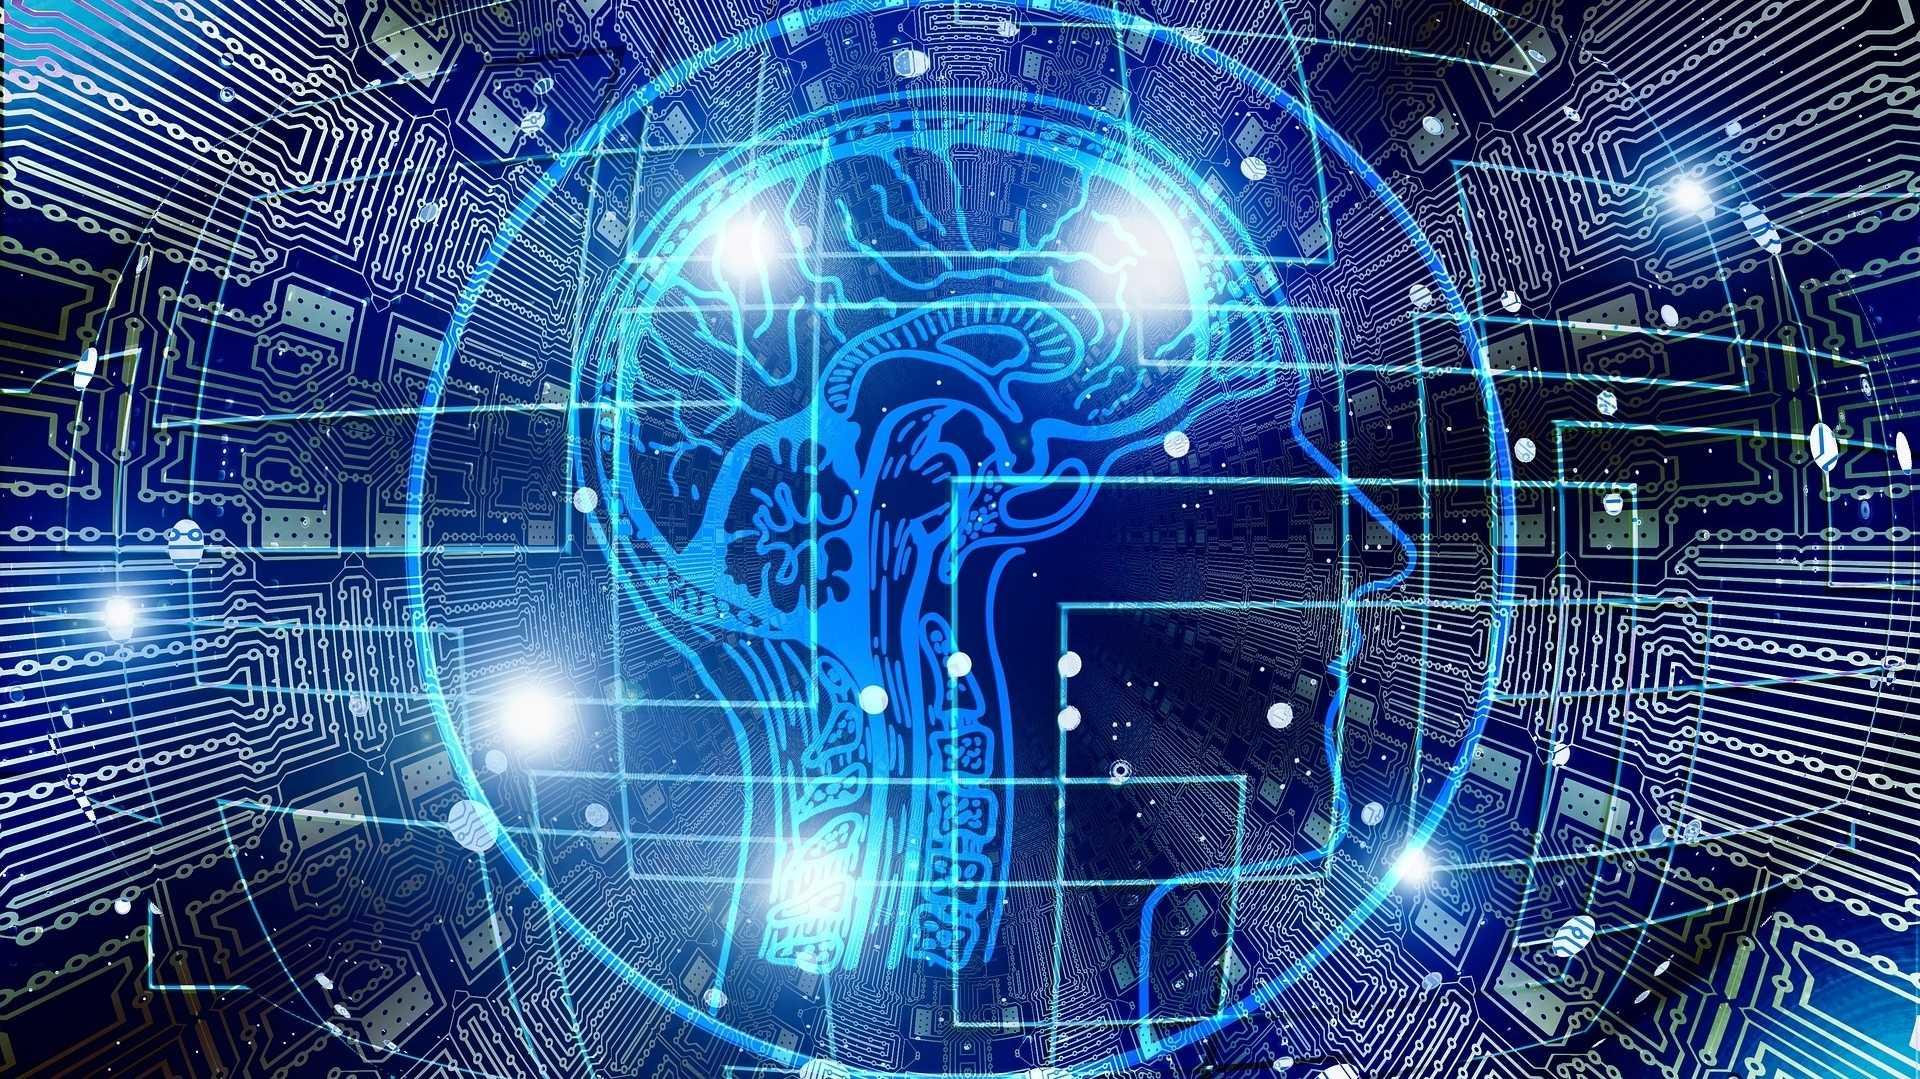 Patentexperten: KI-Systeme sollen patentierbar sein